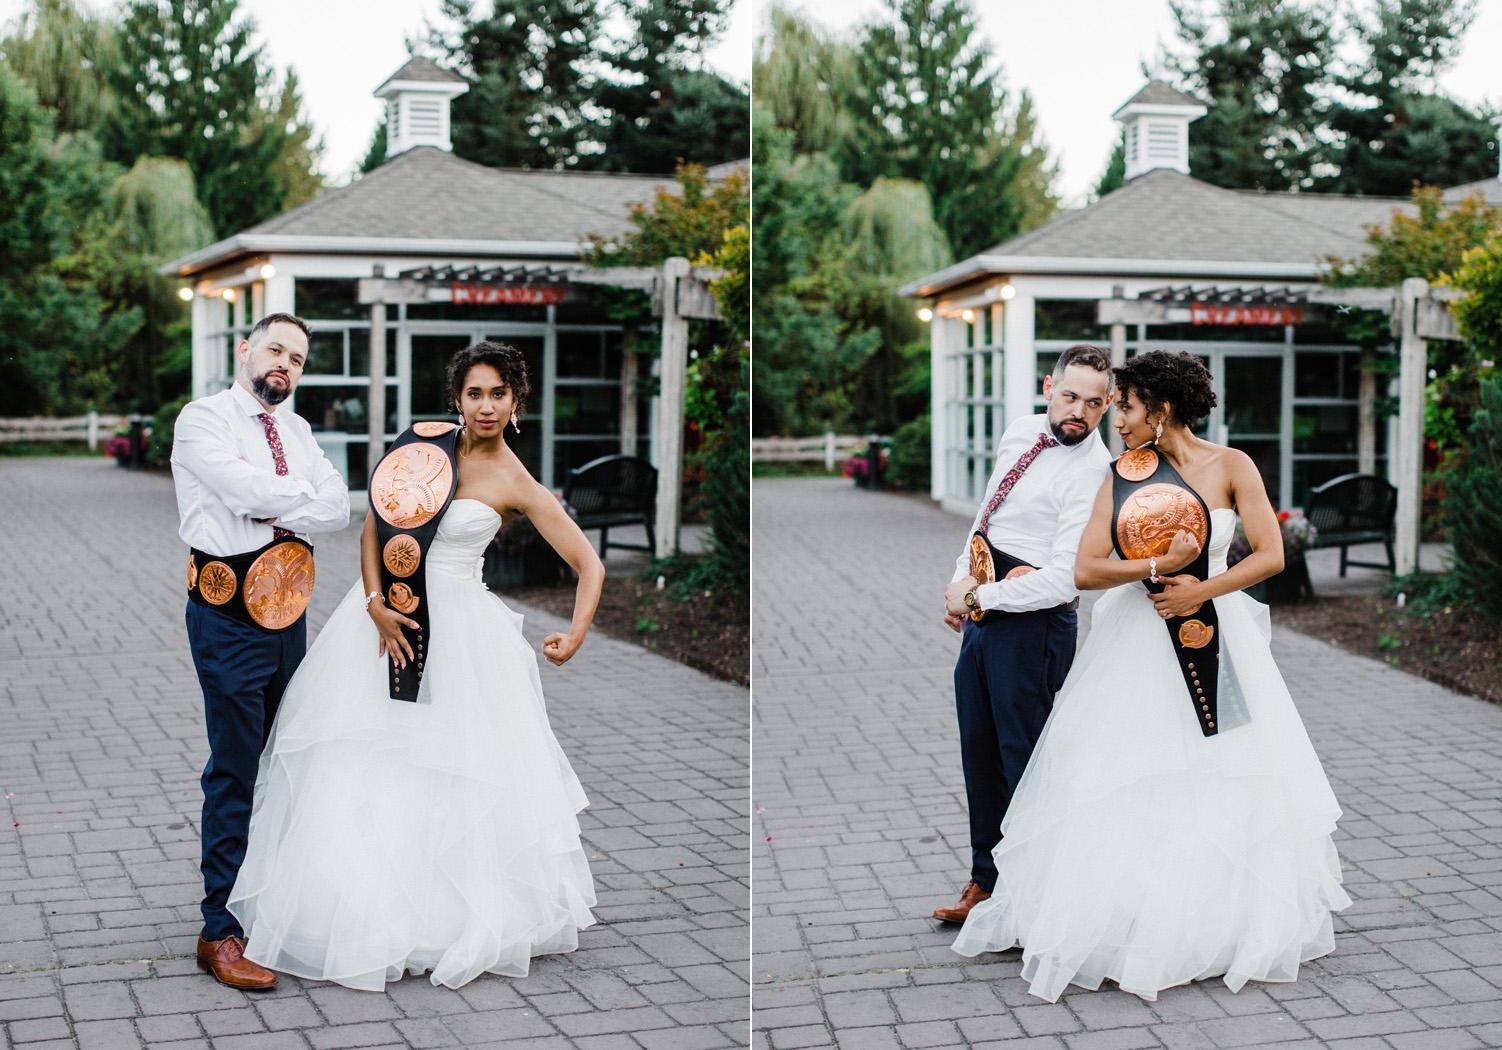 Seattle Wedding Photography Couples Wedding Portraits at Pickering Barn.jpg